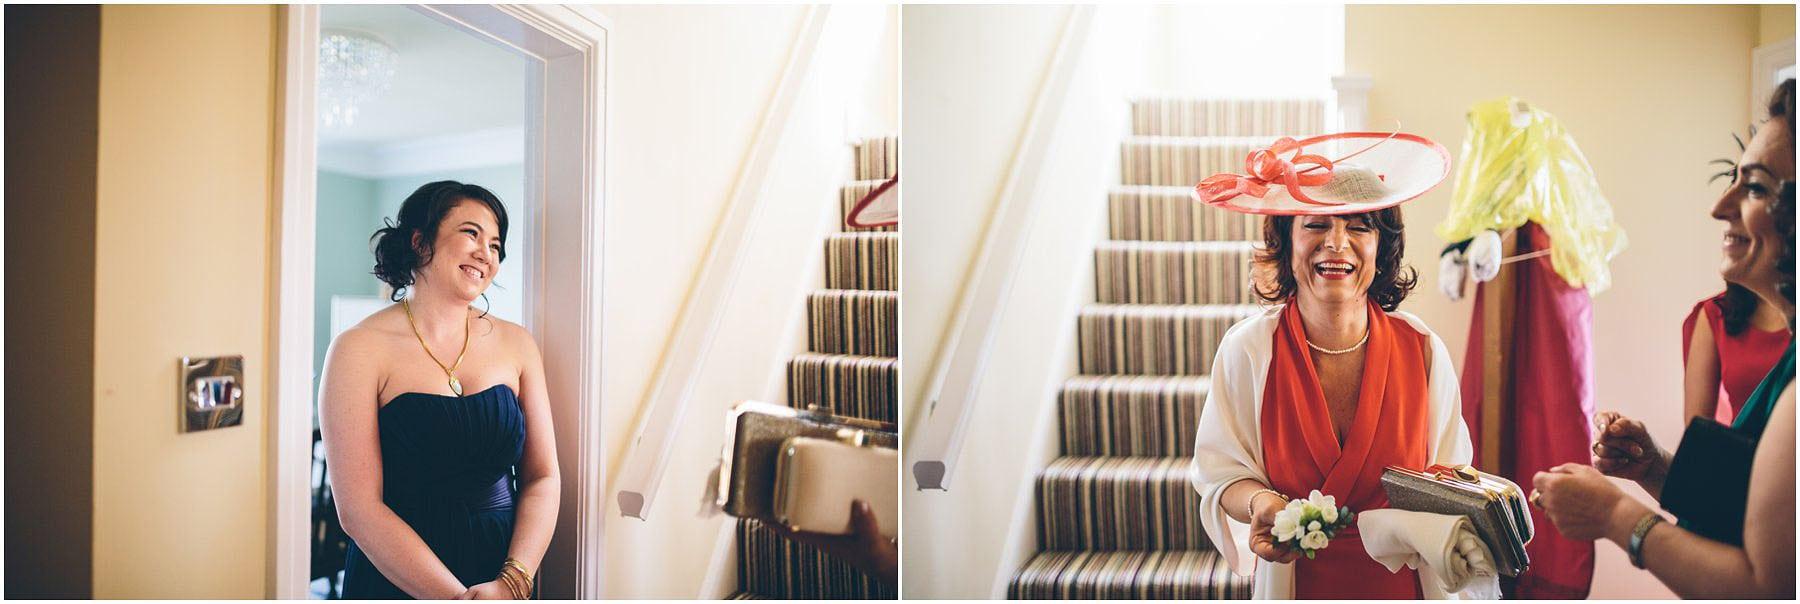 Bowdon_Rooms_Wedding_Photography_0022